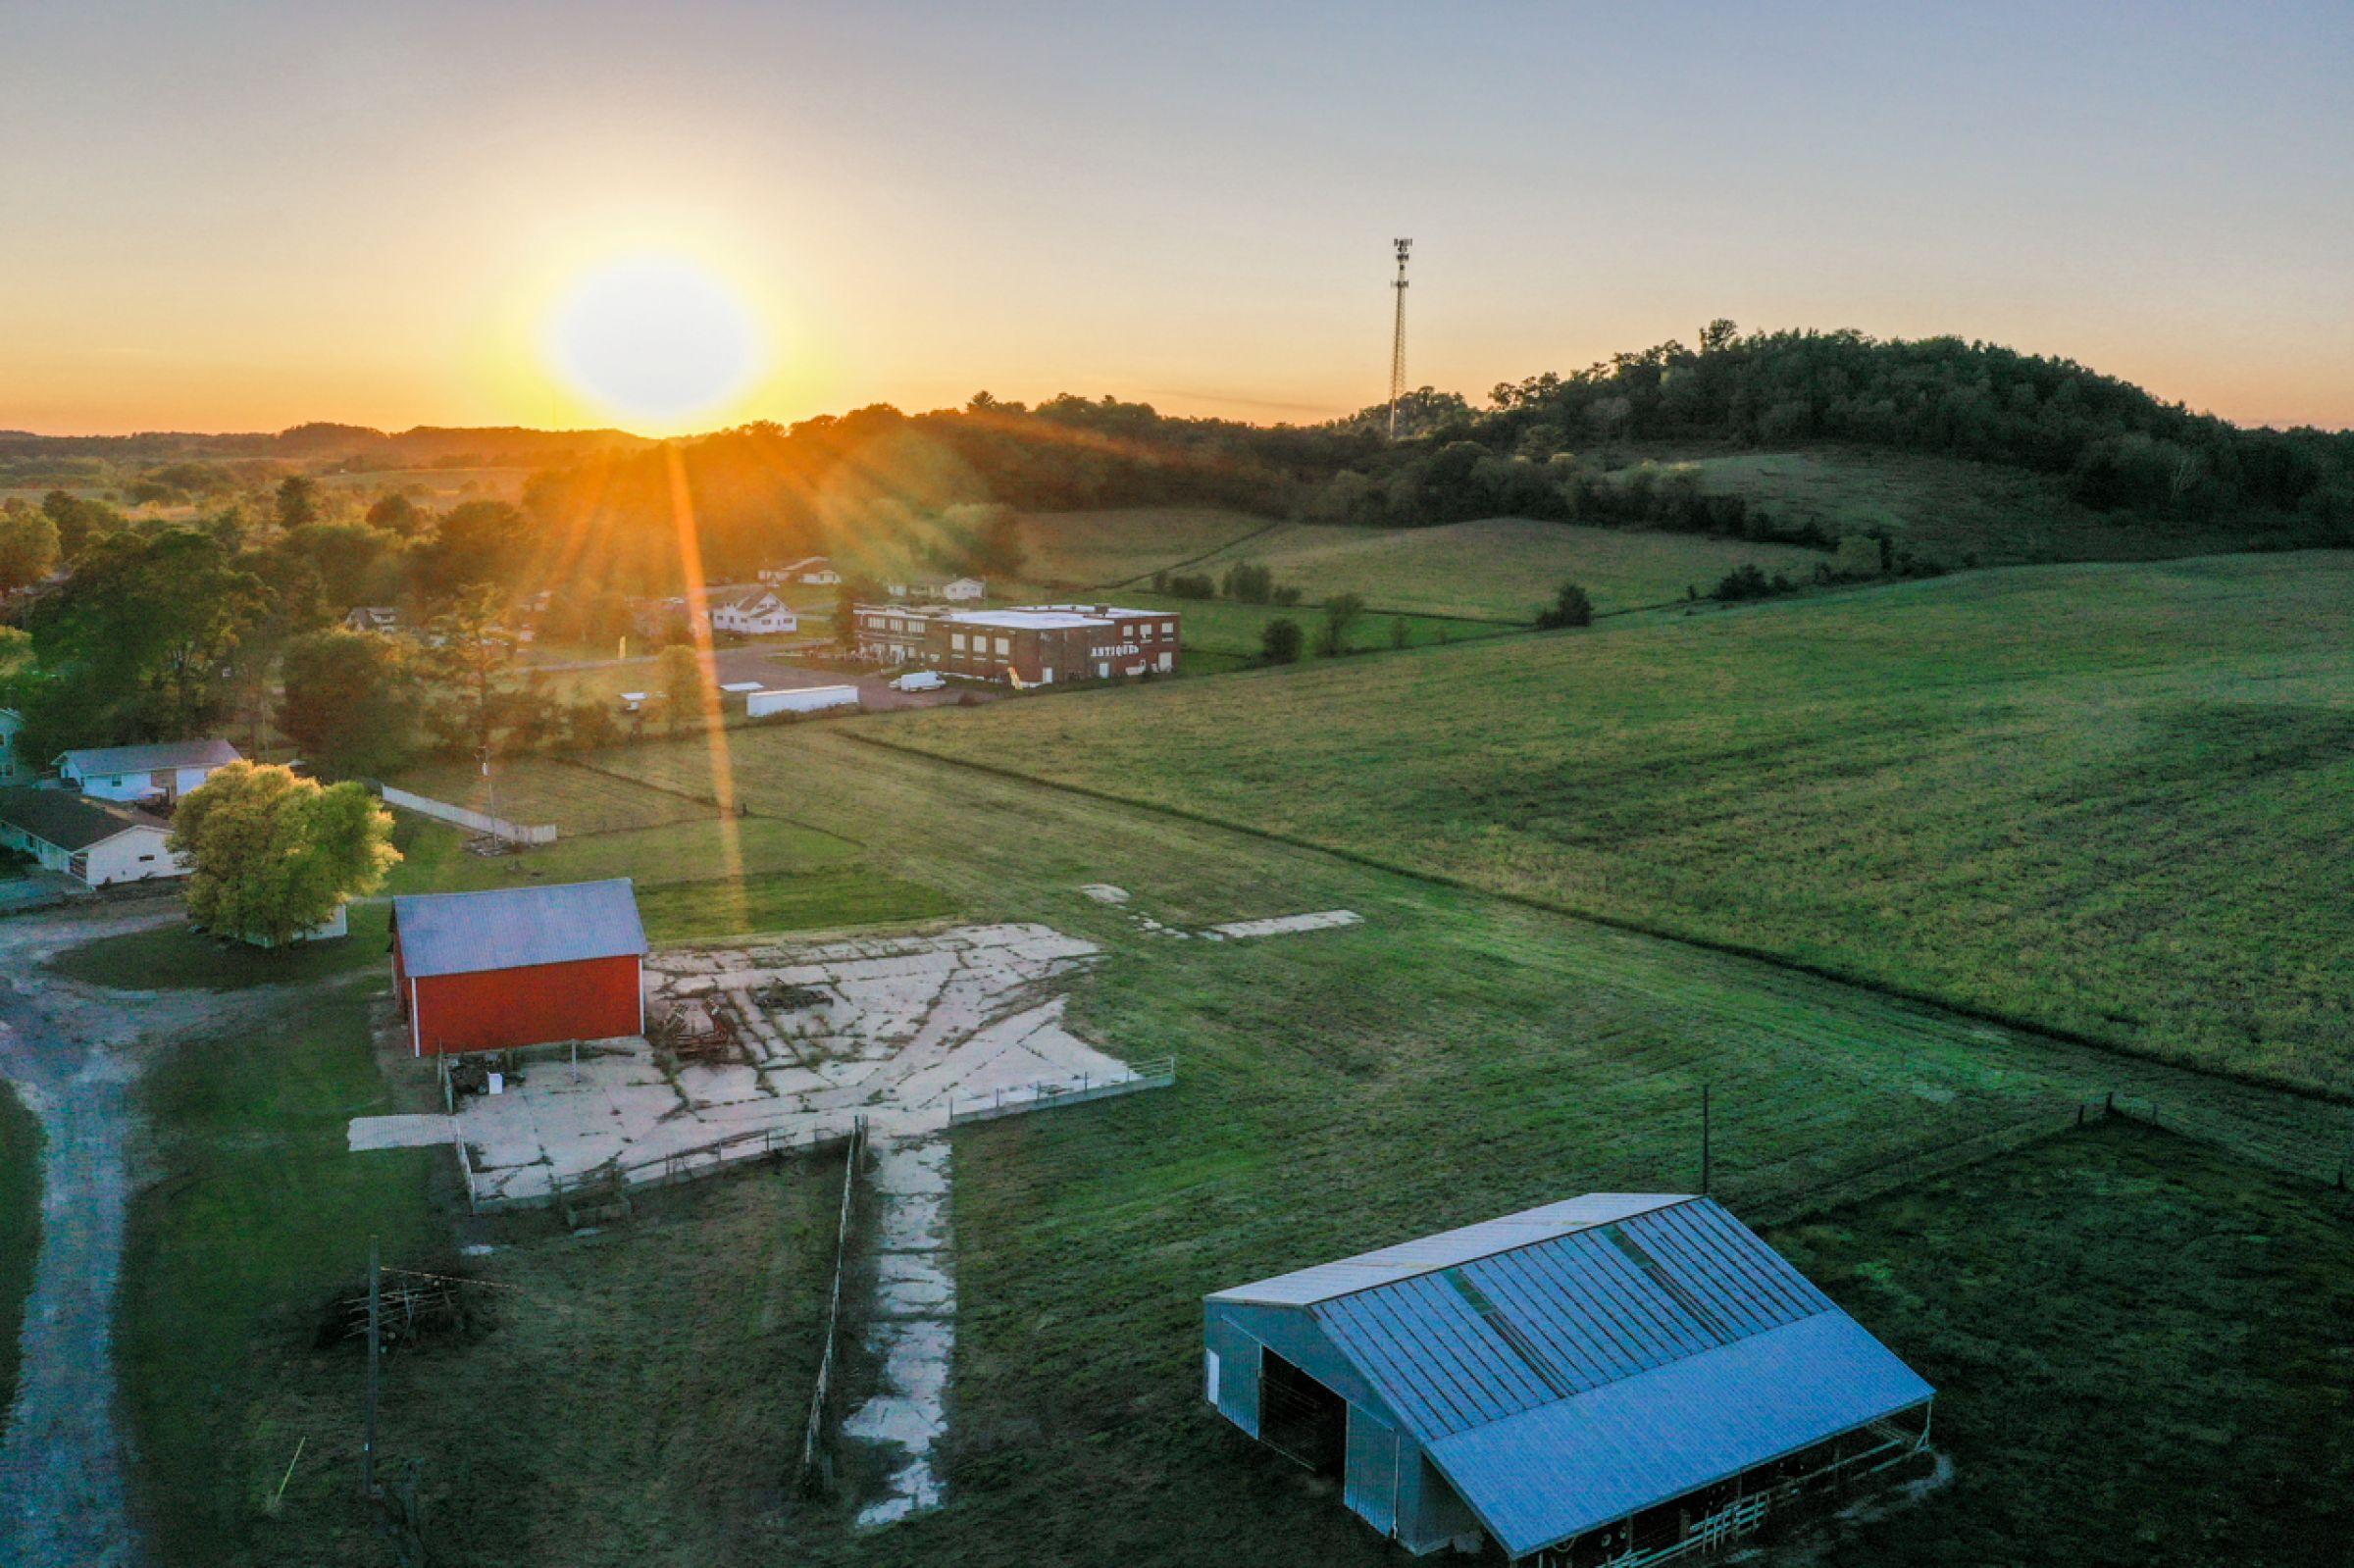 2-4449-acres-ml-3rd-street-hixton-54635-2-2021-09-16-171040.jpg